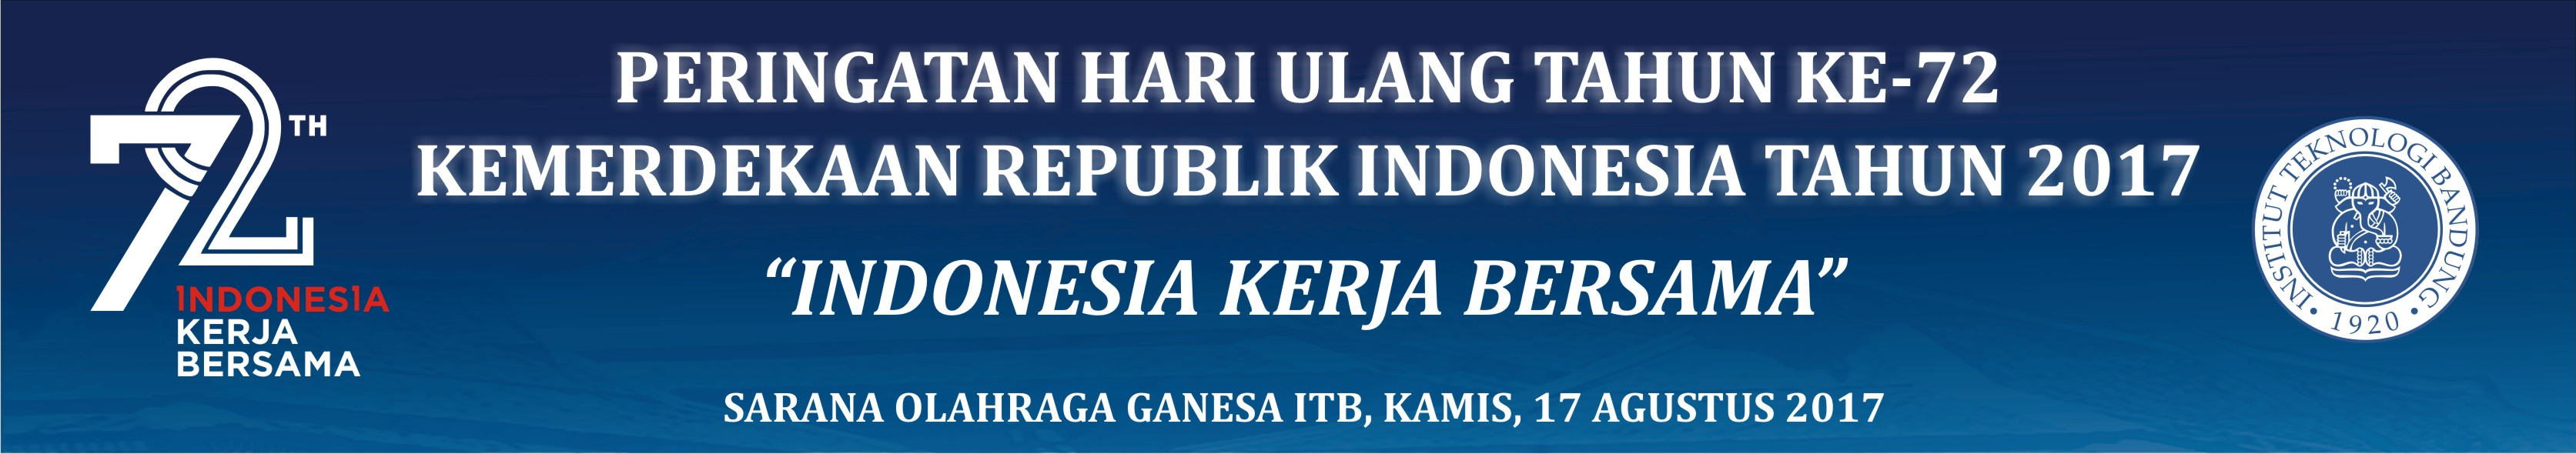 HUT ke-72 Republik Indonesia